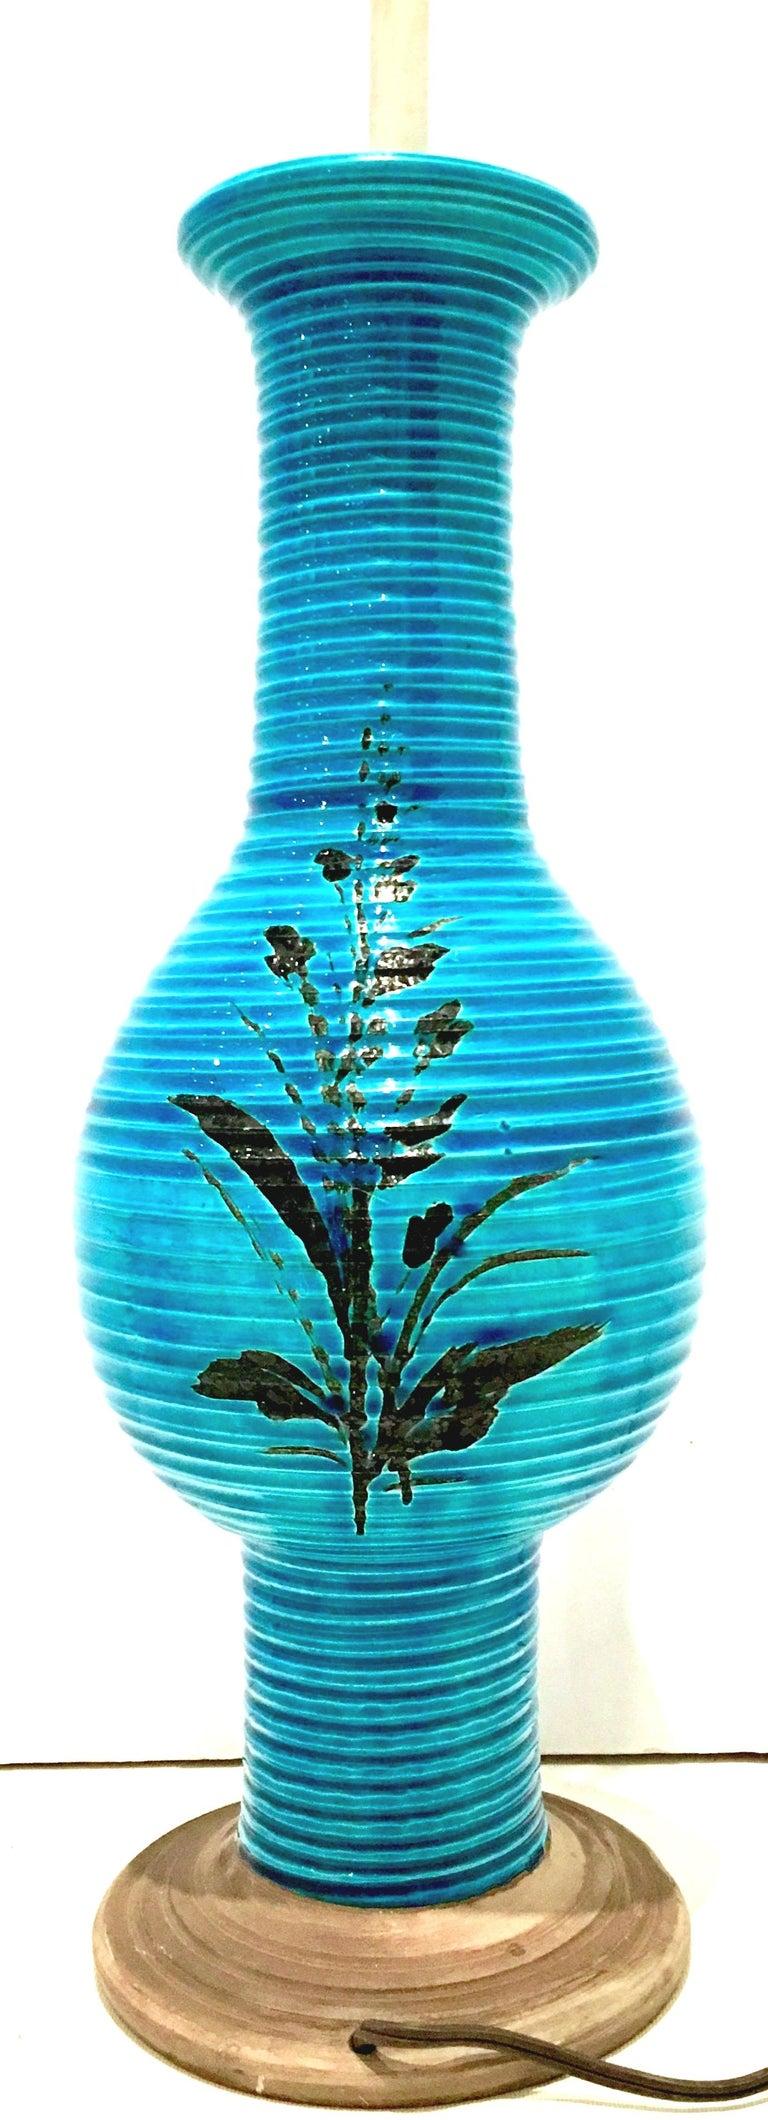 20th Century 1960s Italian Cerulean Blue & Black Ceramic Glaze Pottery Lamp by, Bitossi For Sale